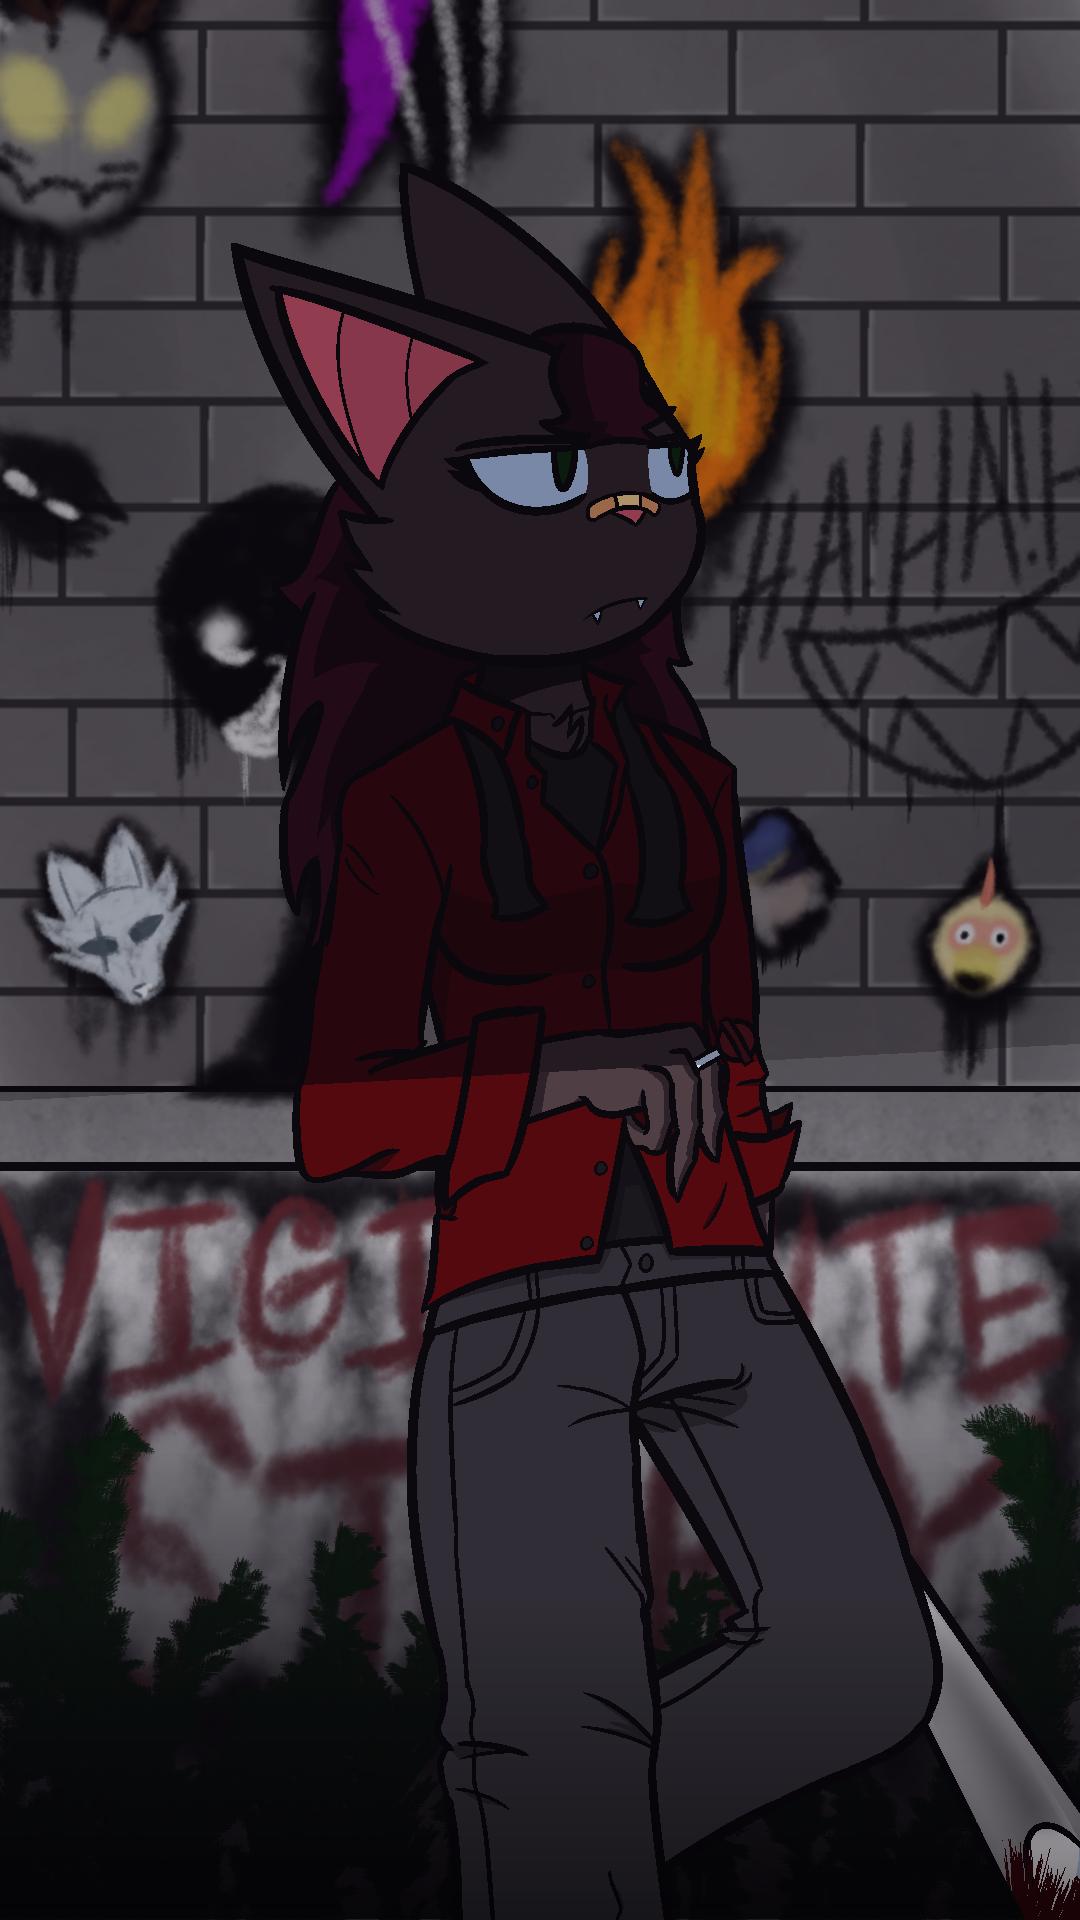 The Vigilant Investigator